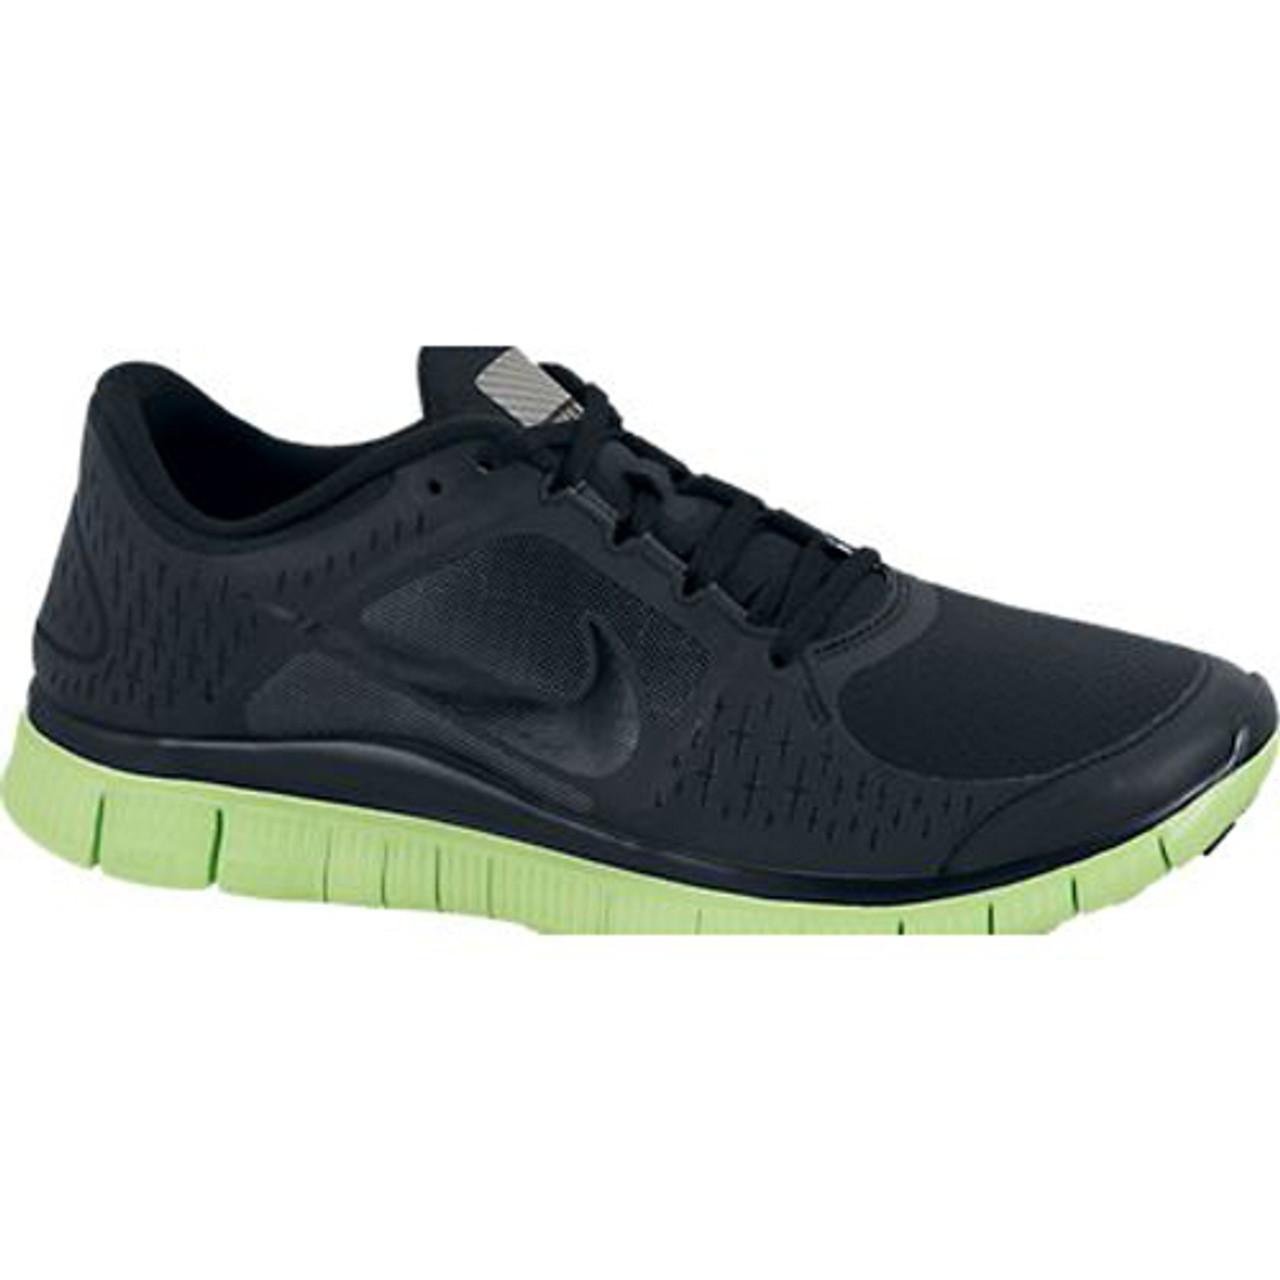 New Nike Free Run +3 Shield BlackGreen Mens Running Shoes